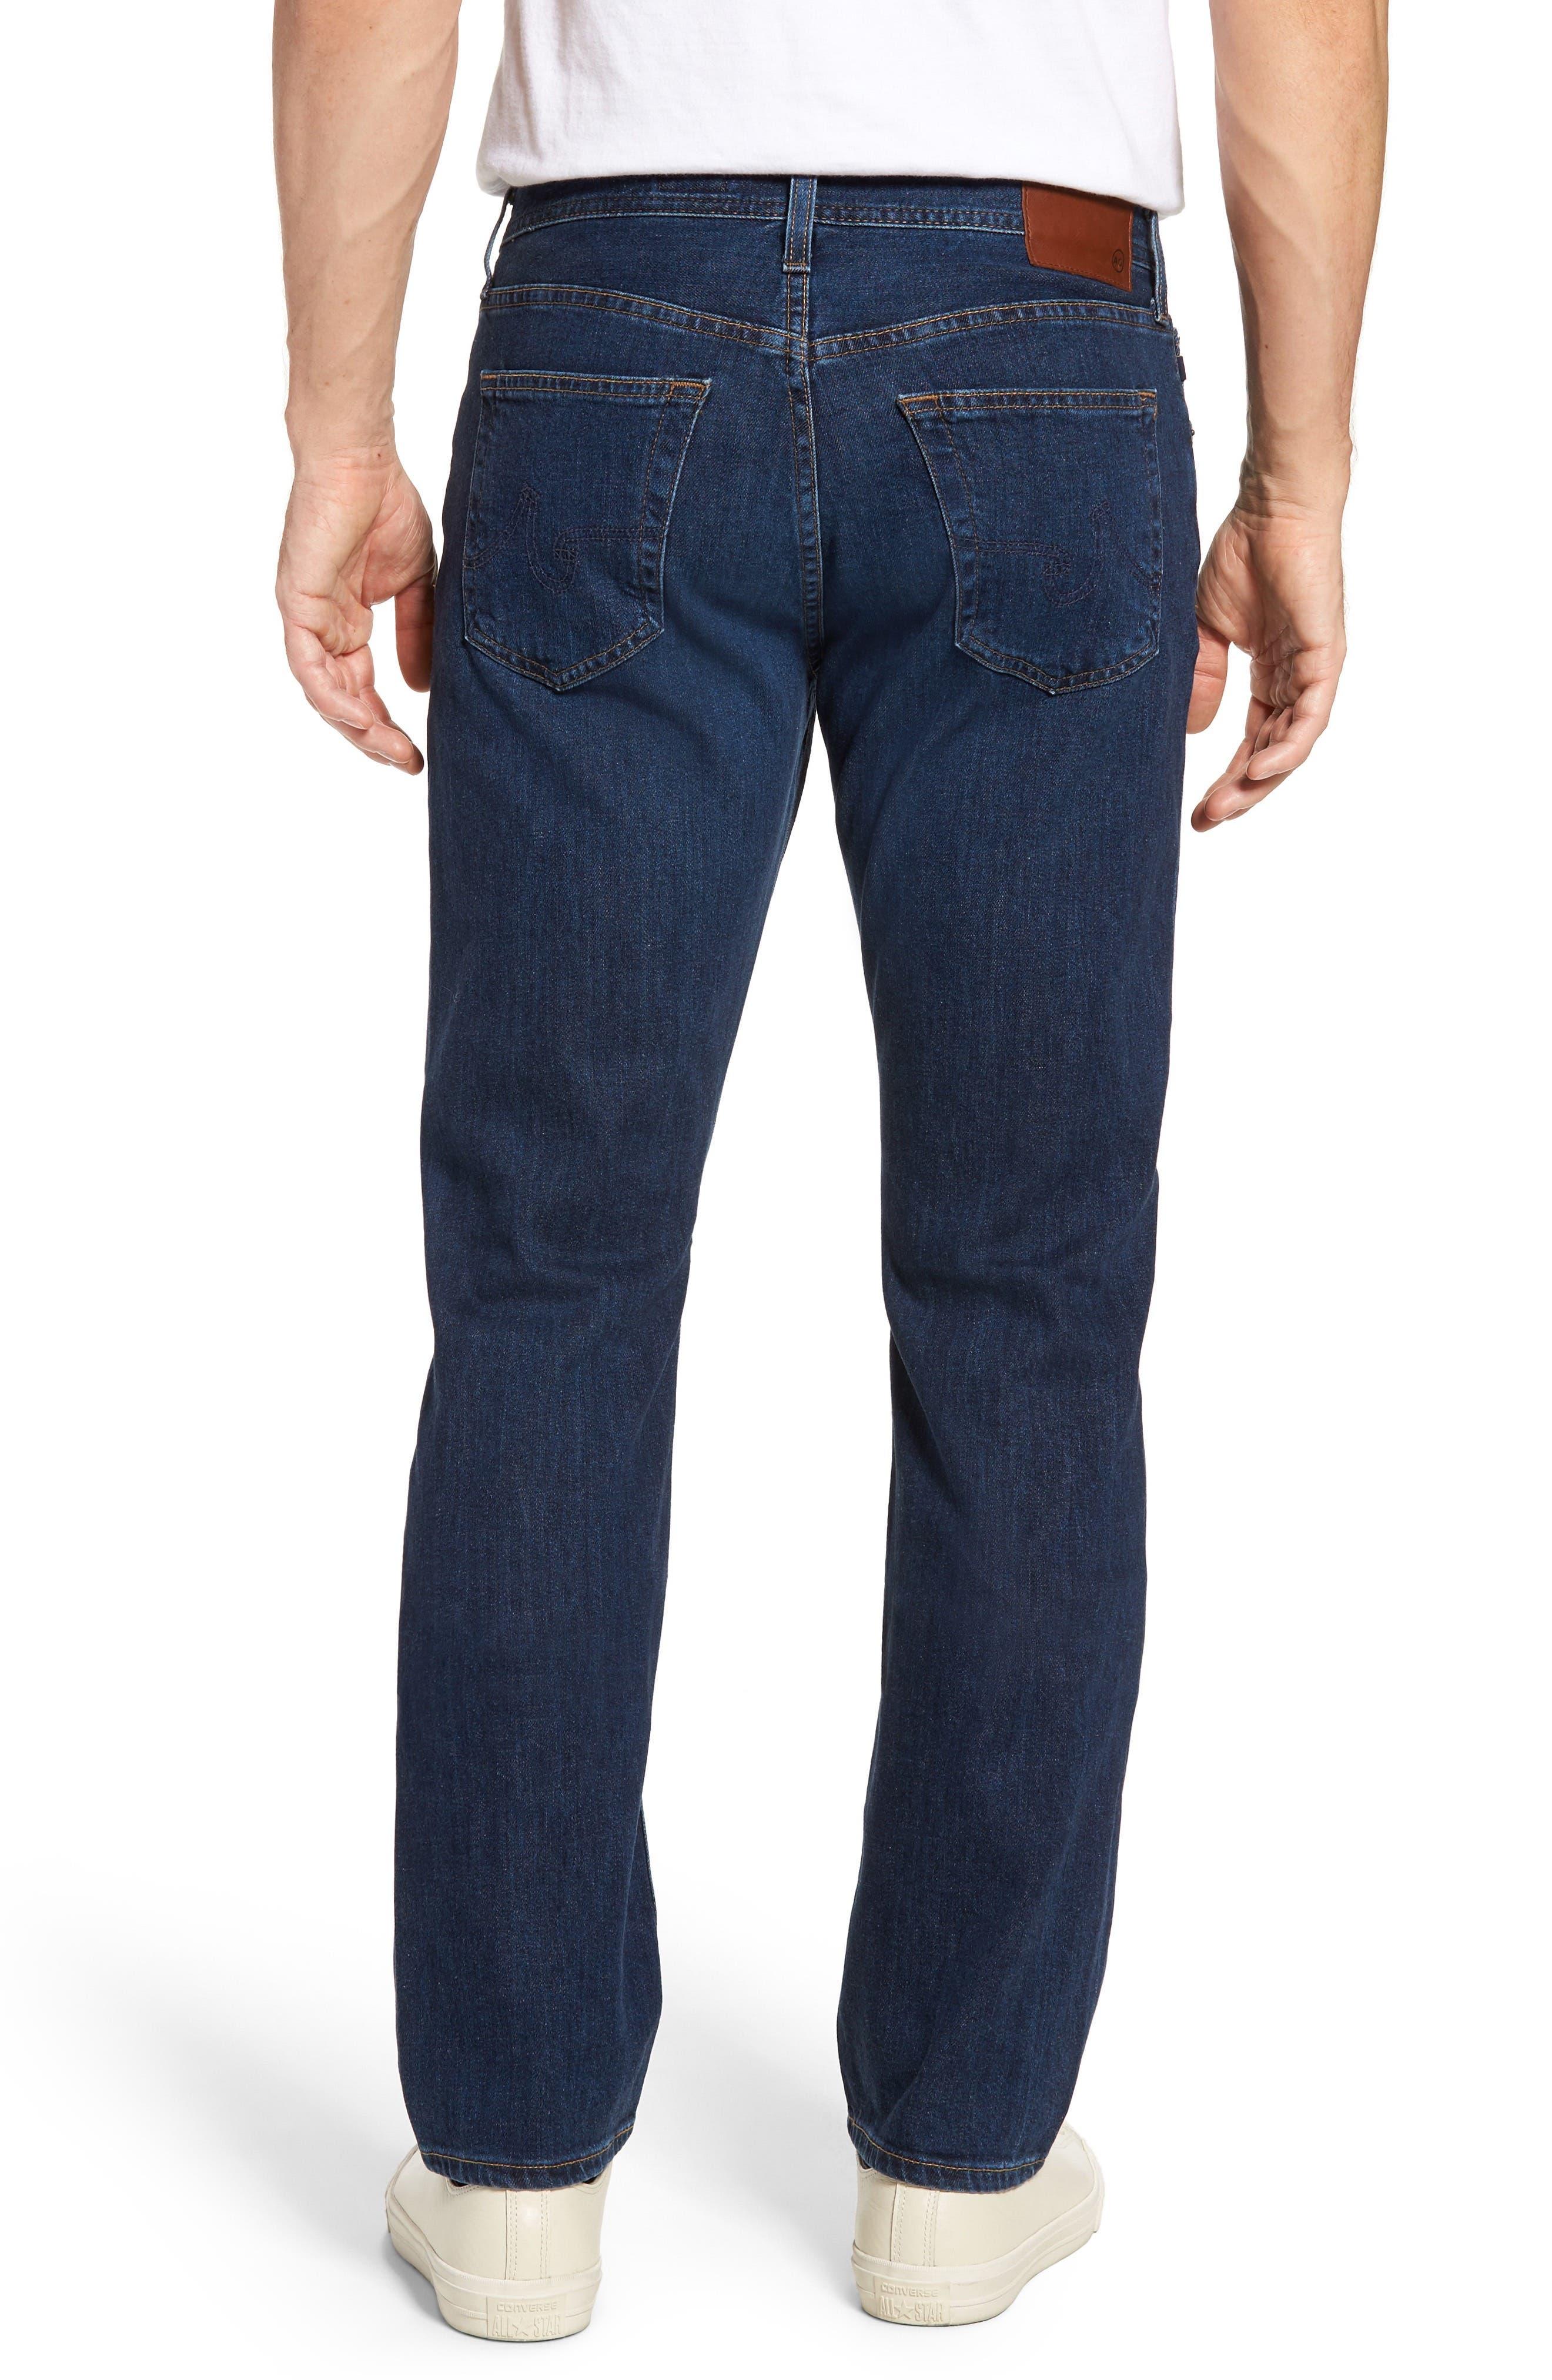 Graduate Slim Straight Leg Jeans,                             Alternate thumbnail 2, color,                             435